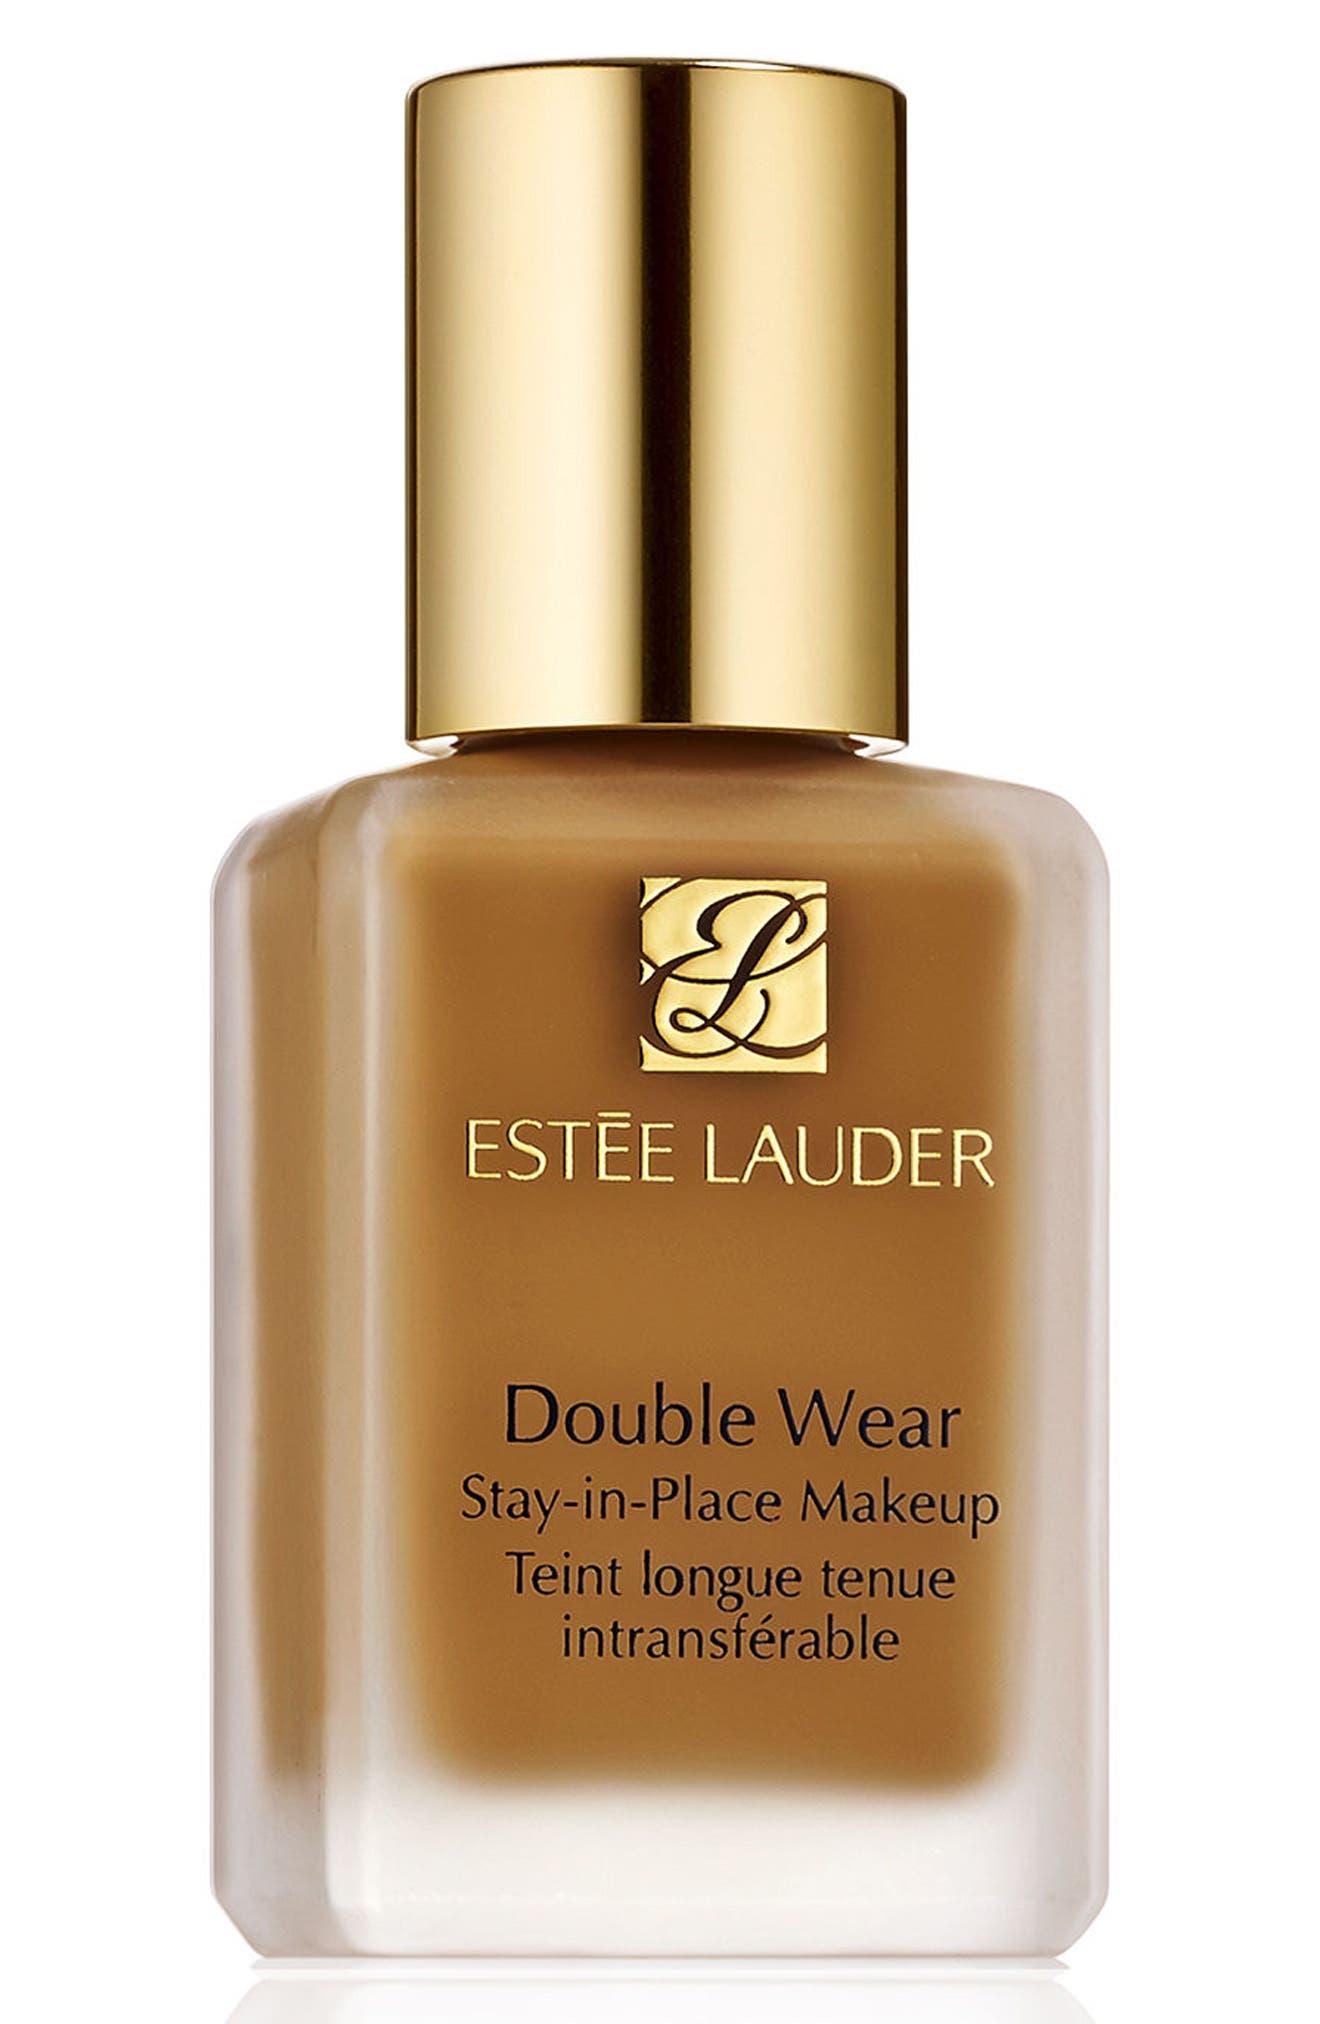 Estee Lauder Double Wear Stay-In-Place Liquid Makeup - 5N2 Amber Honey